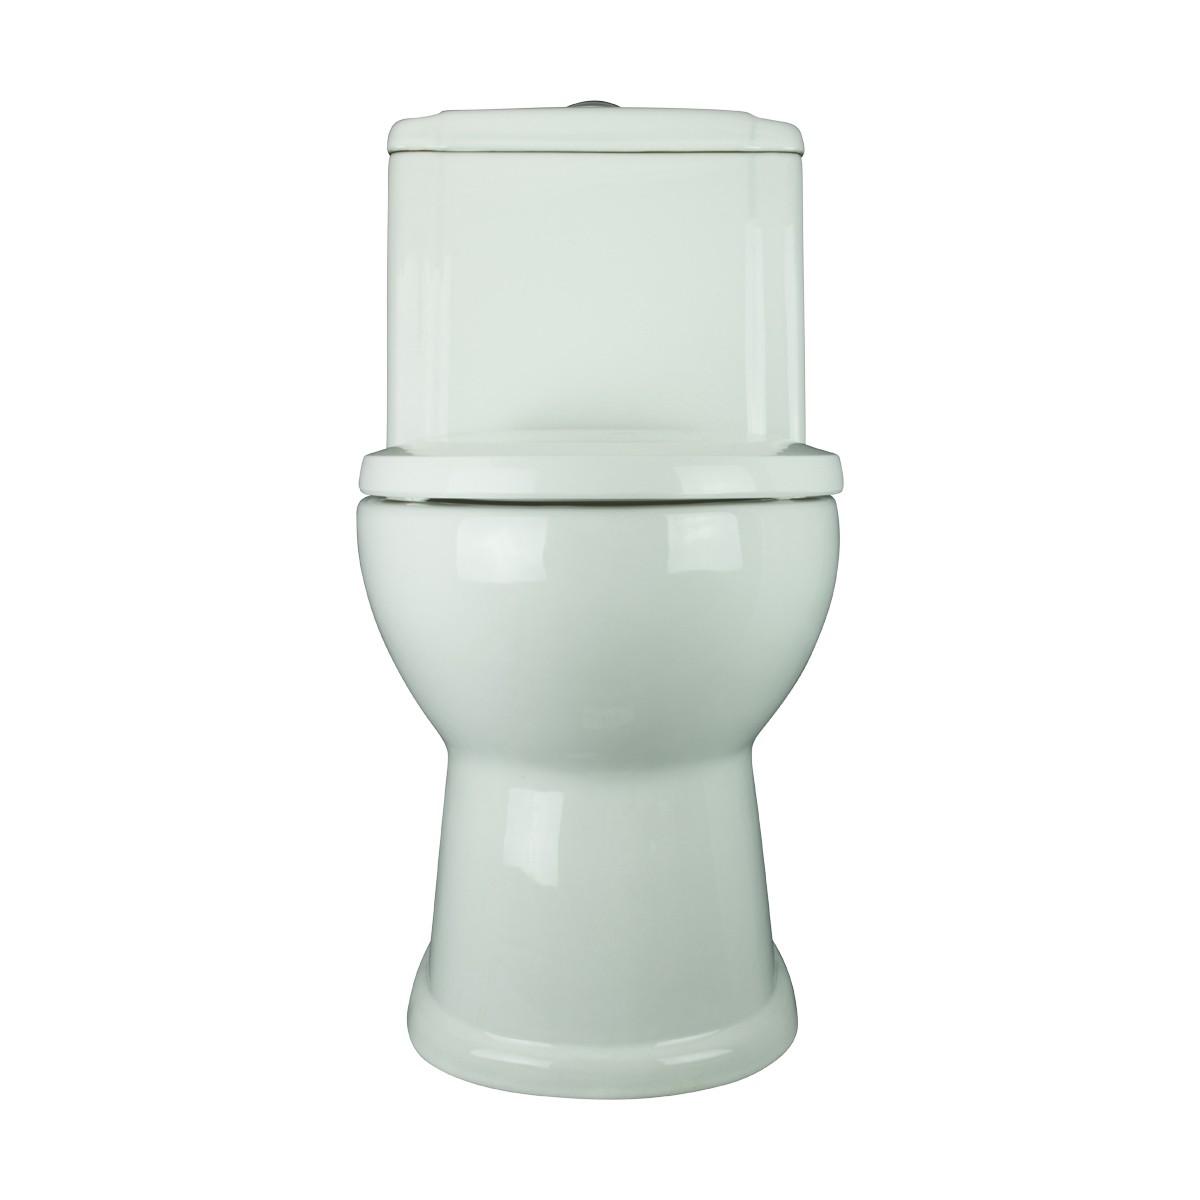 Porcelain Childs Toilet Potty Training Ceramic Porcelain Small Toilet White Childs Toilet Childs Potty Training Toilet porcelain ceramic bathroom small